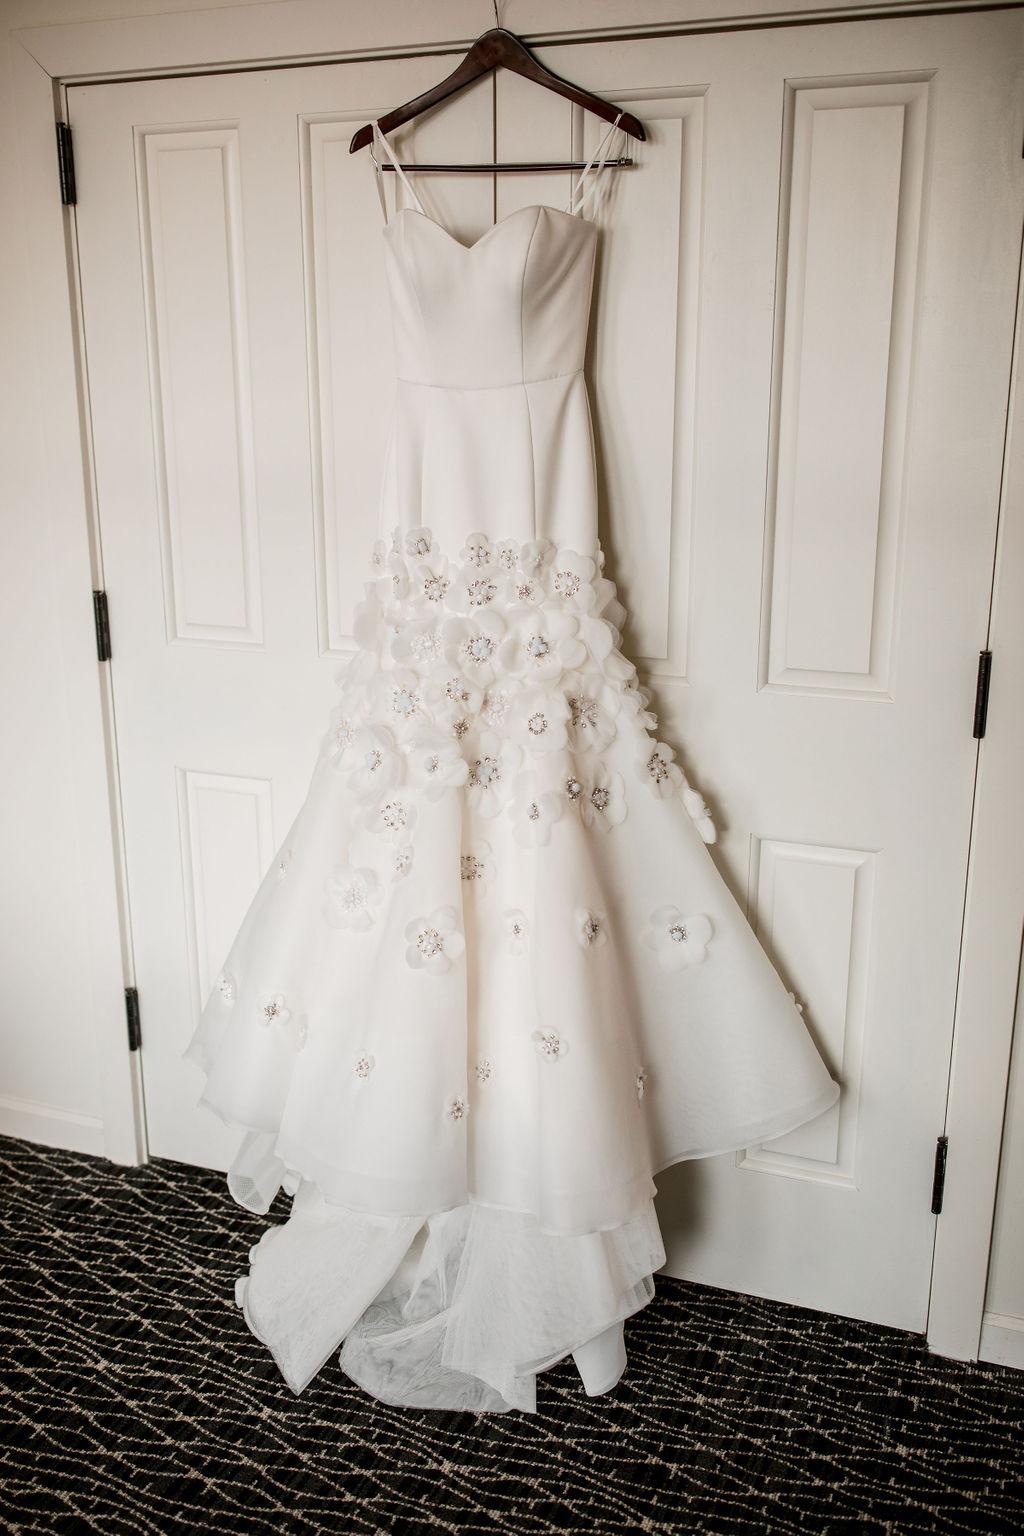 Floral encrusted wedding dress: Lavish Union Station Hotel Wedding featured on Nashville Bride Guide